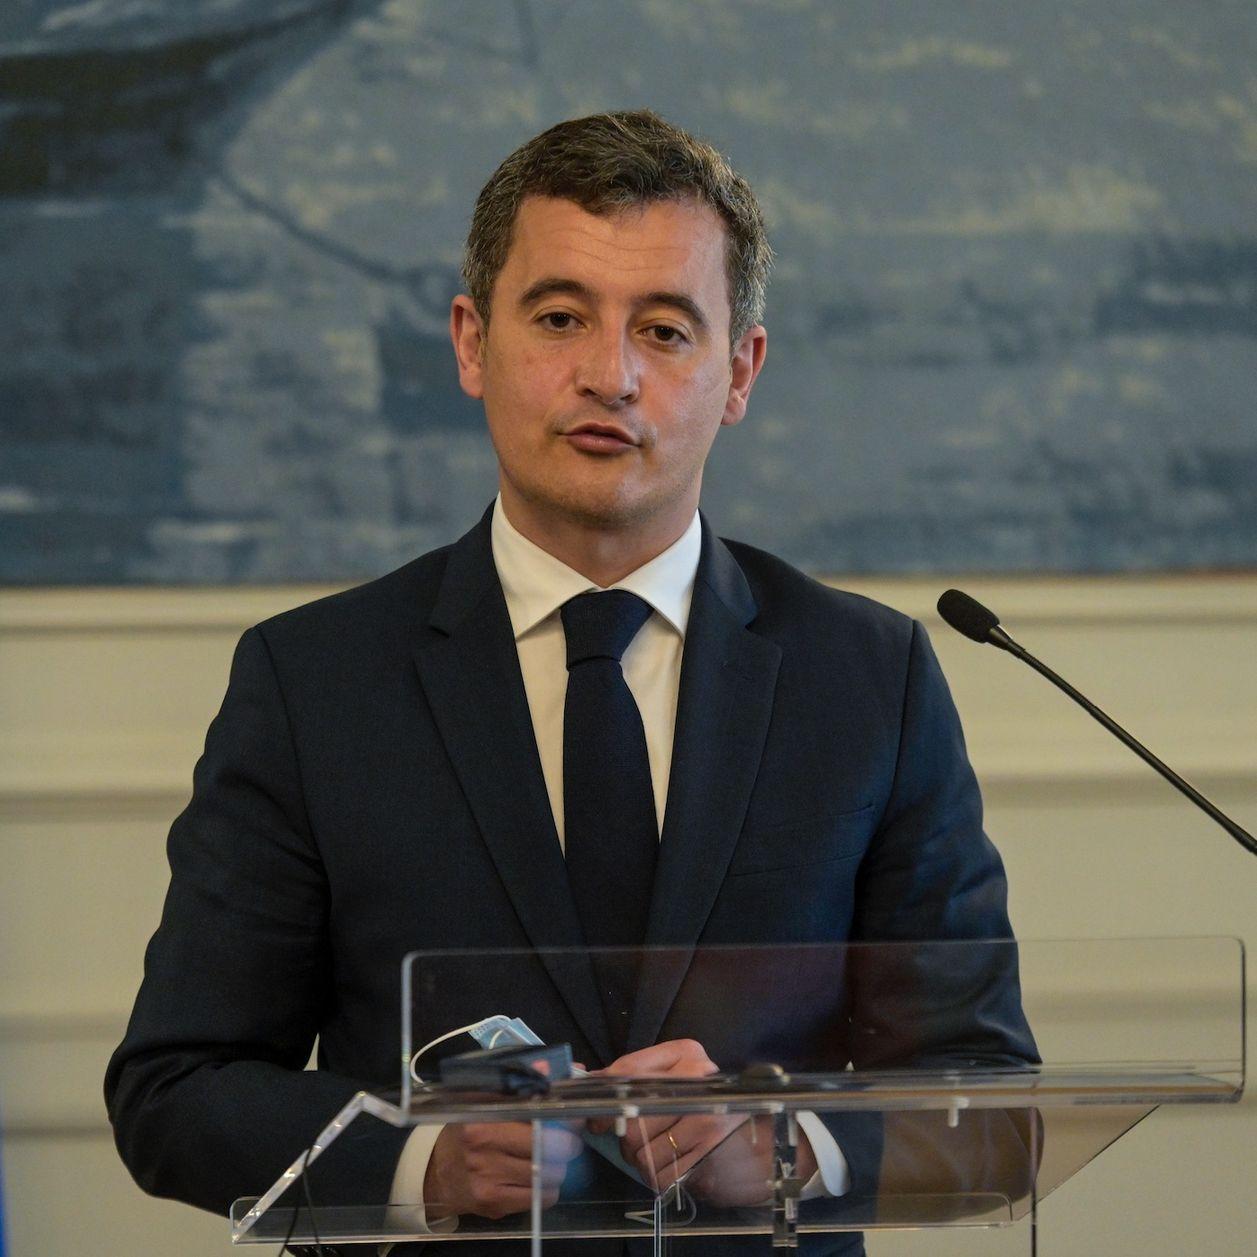 Gérald Darmanin : fin des investigations sur les accusations de viol